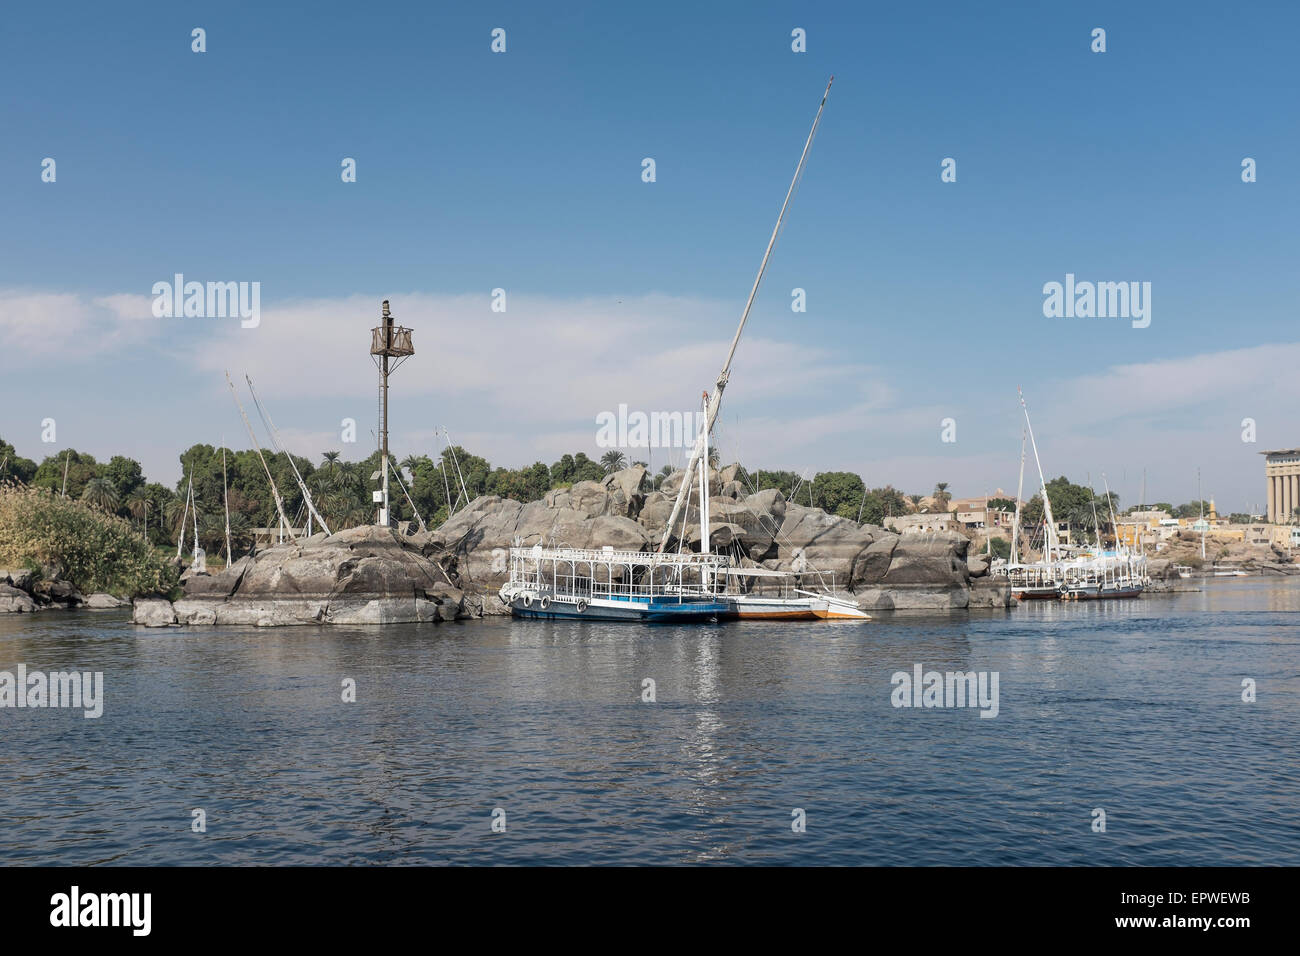 Kitchener Island Stock Photos & Kitchener Island Stock Images - Page ...